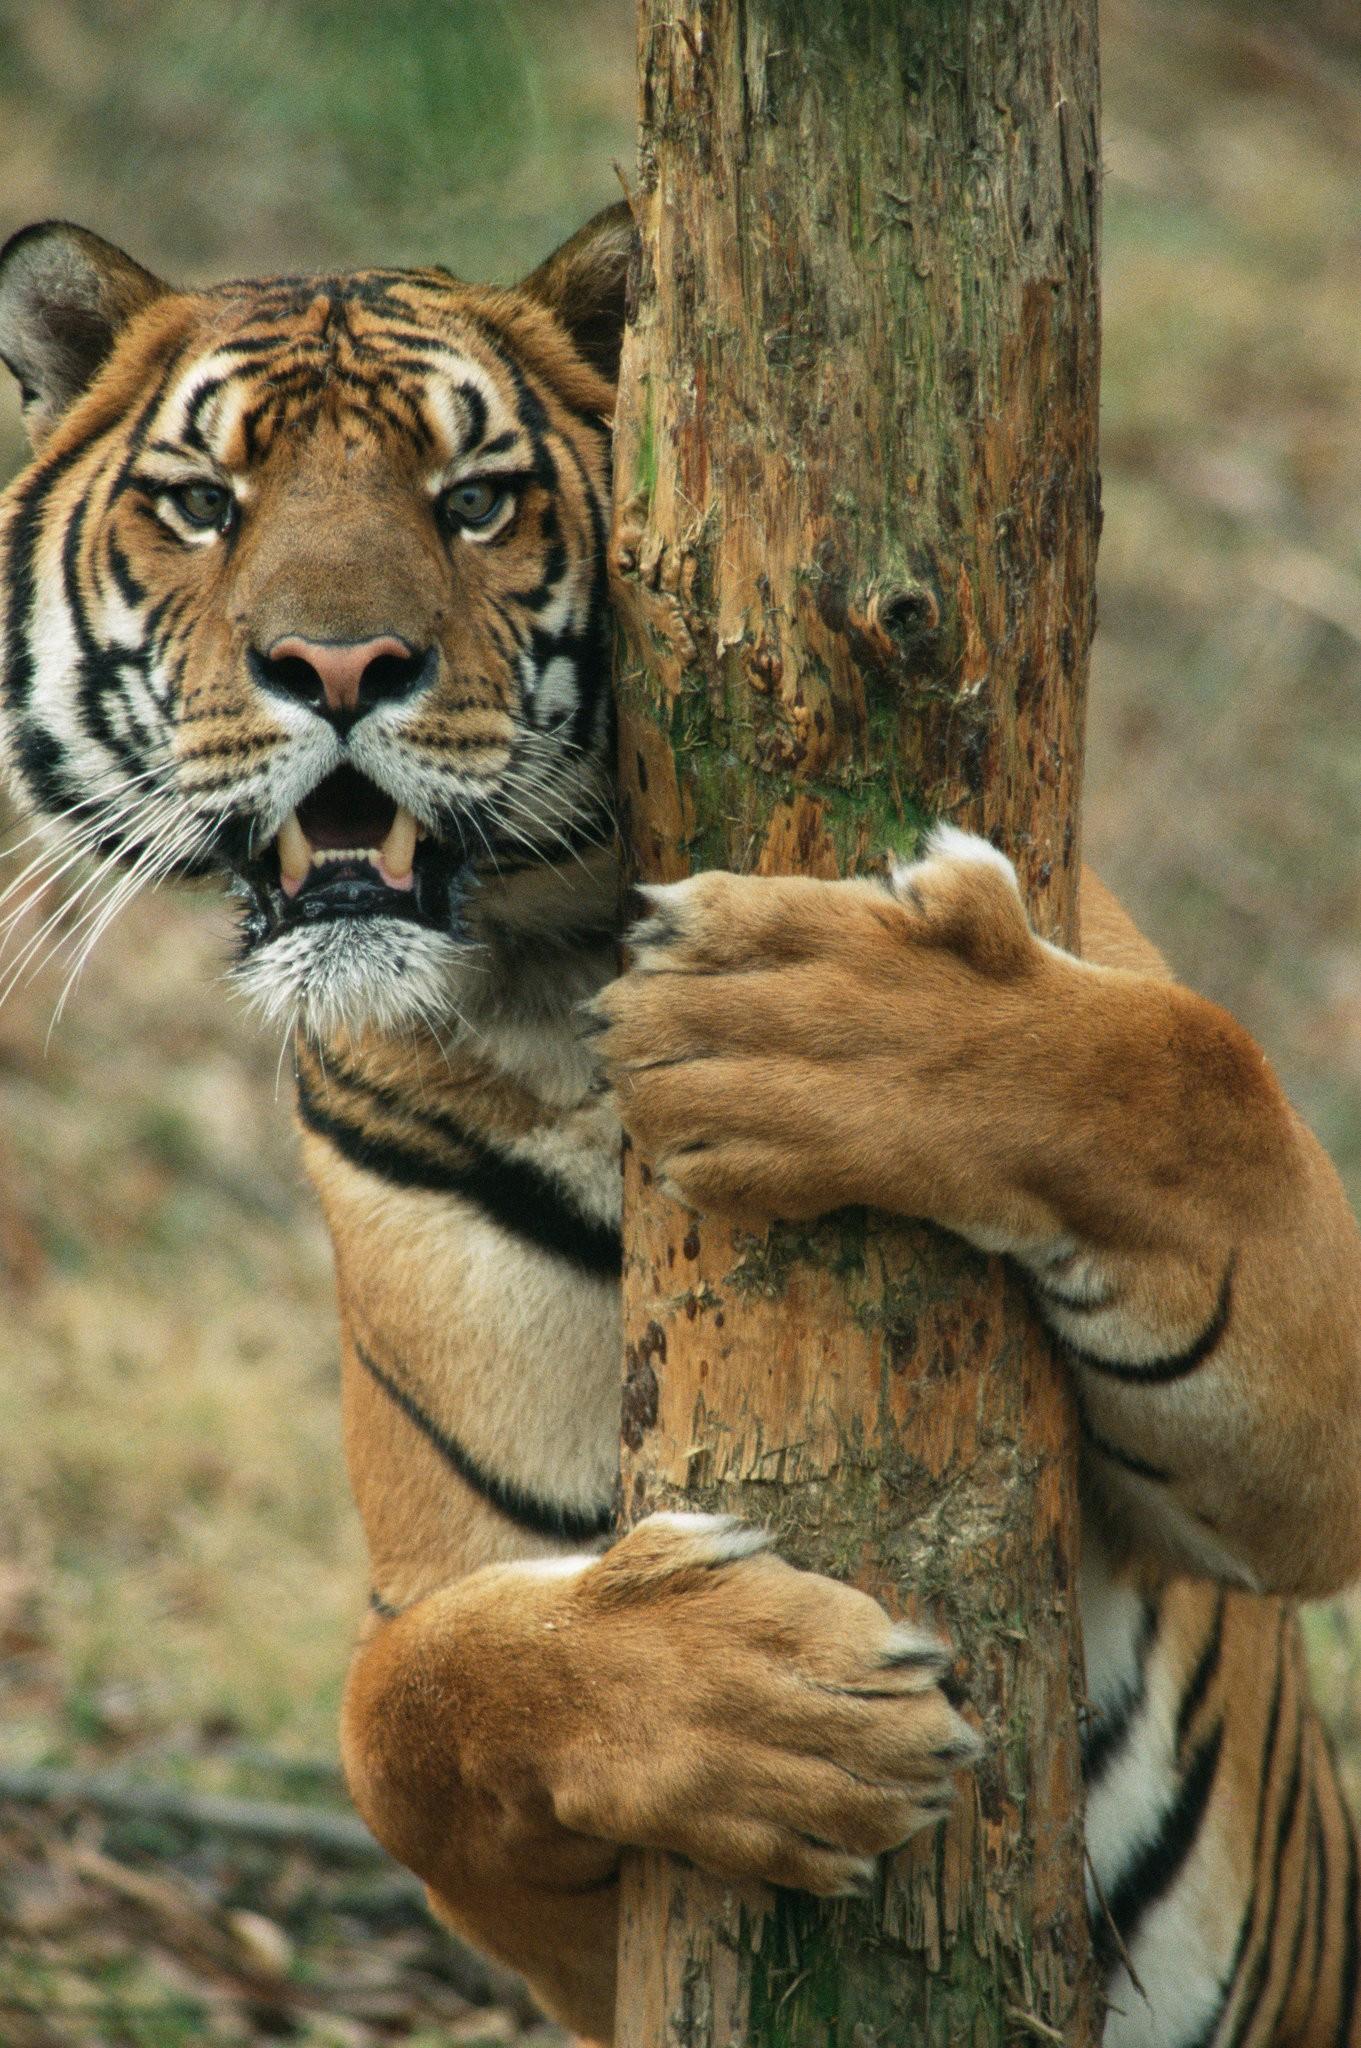 Tiger Extinction Climate Change Poaching Habitat Loss